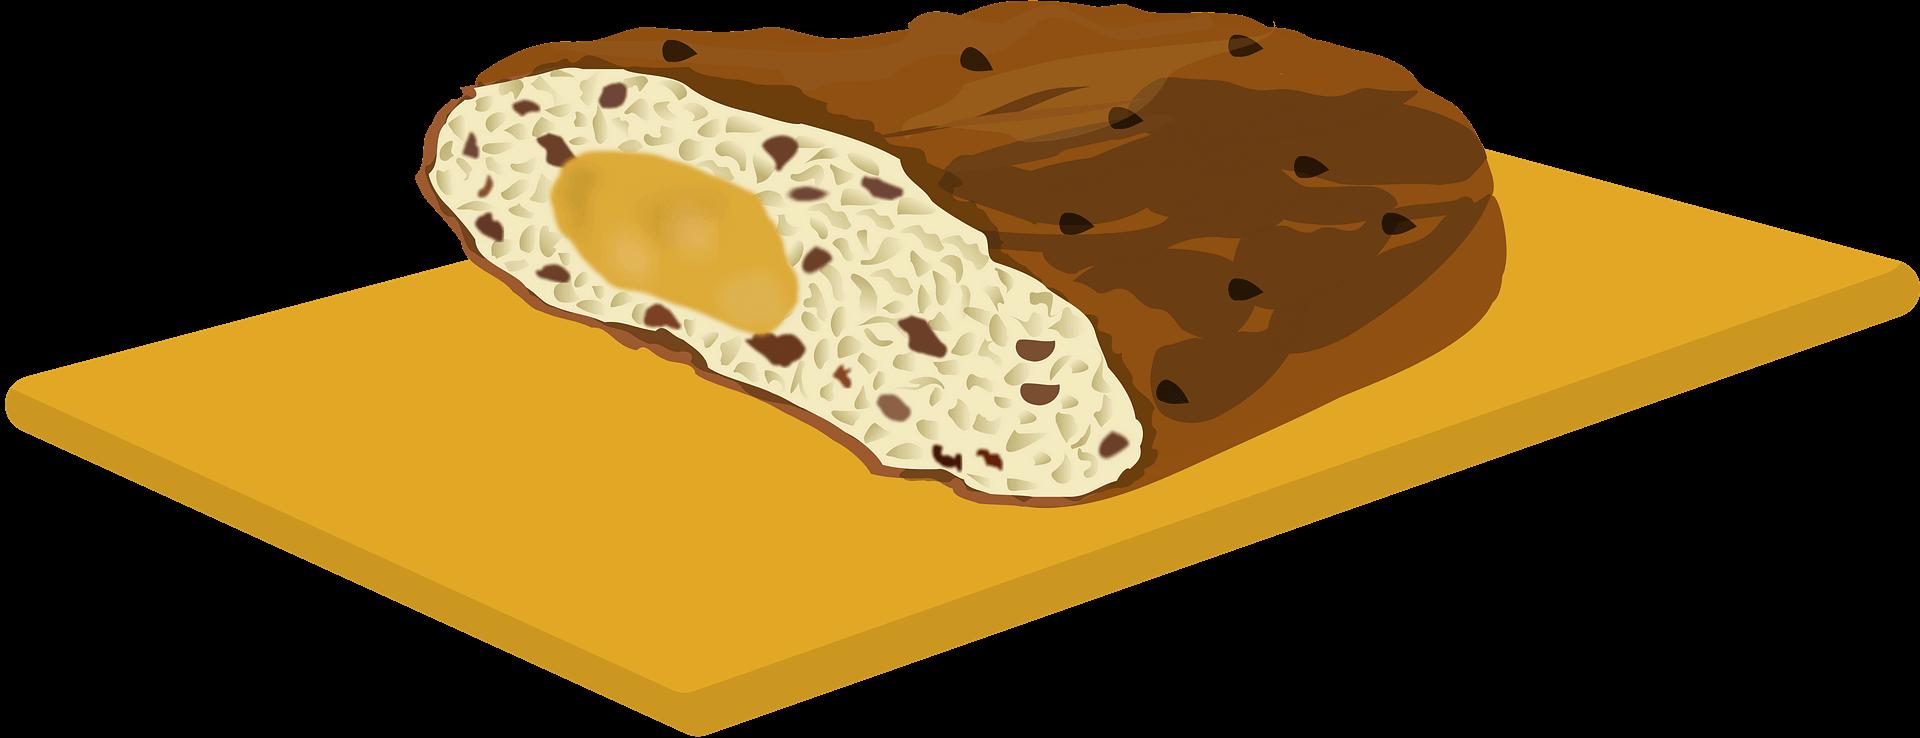 Bread clipart transparent free